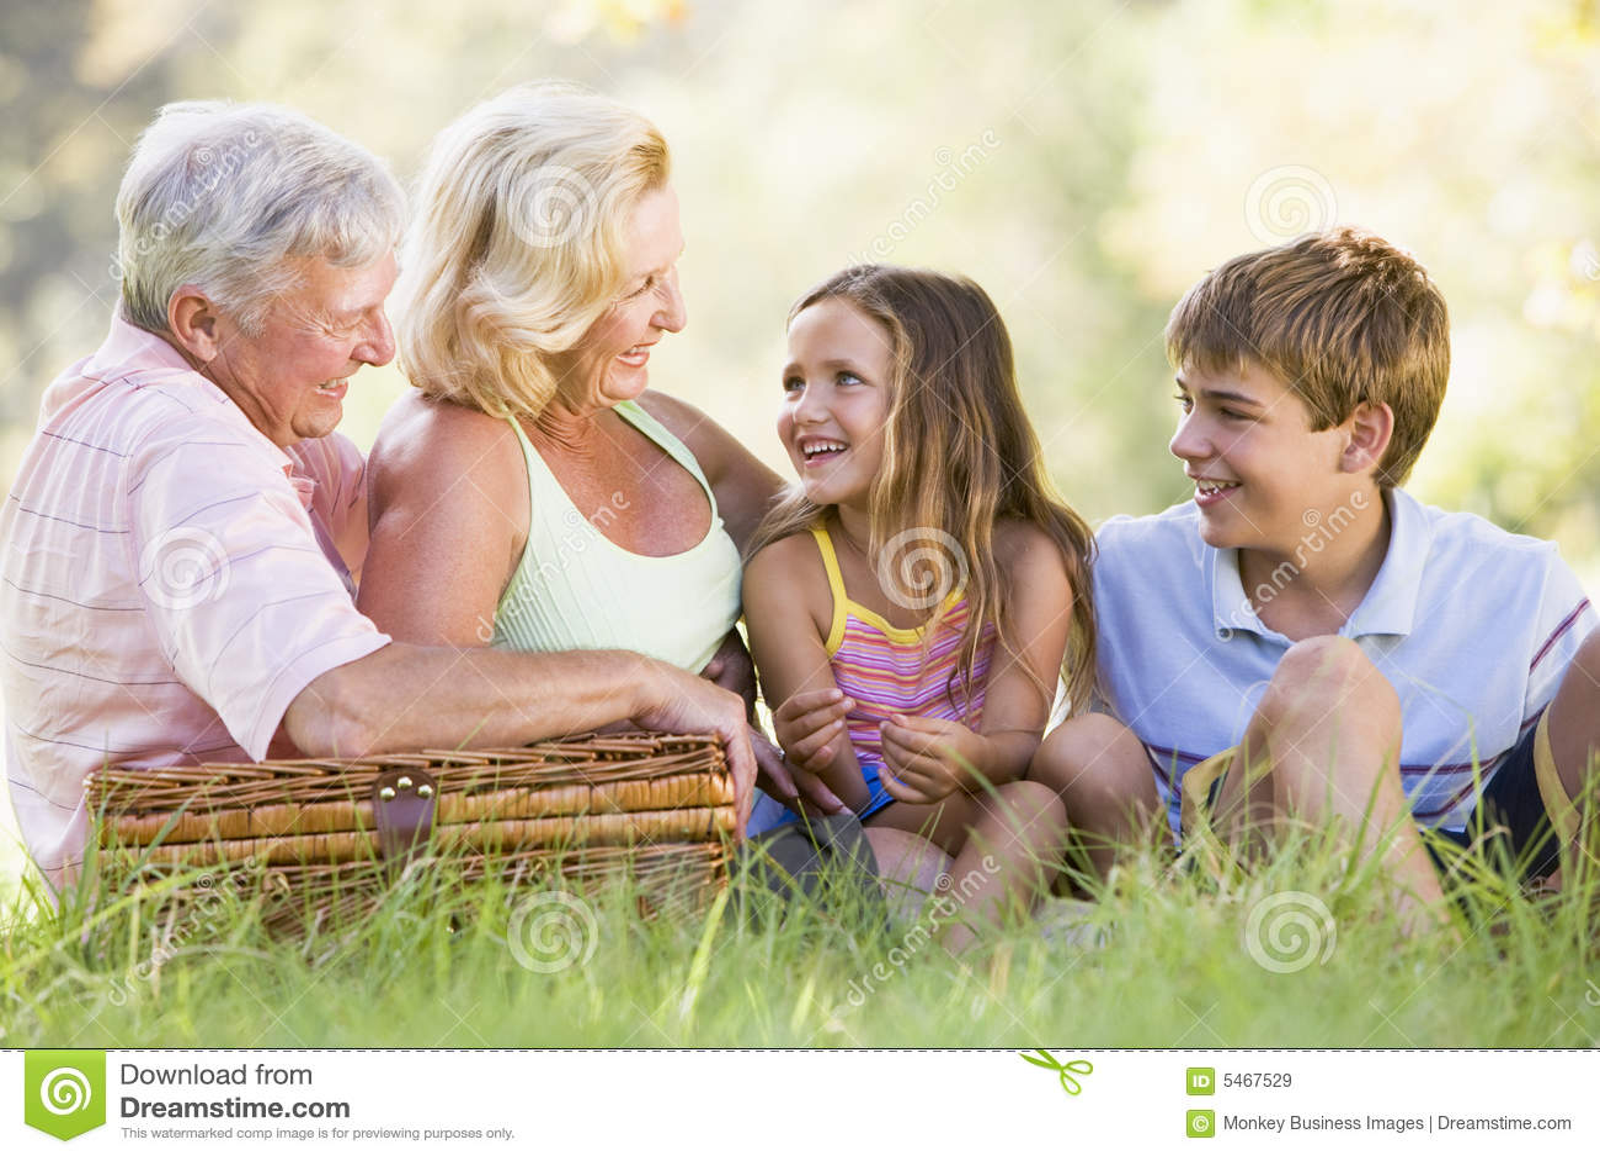 Grandparents having a picnic with grandchildren